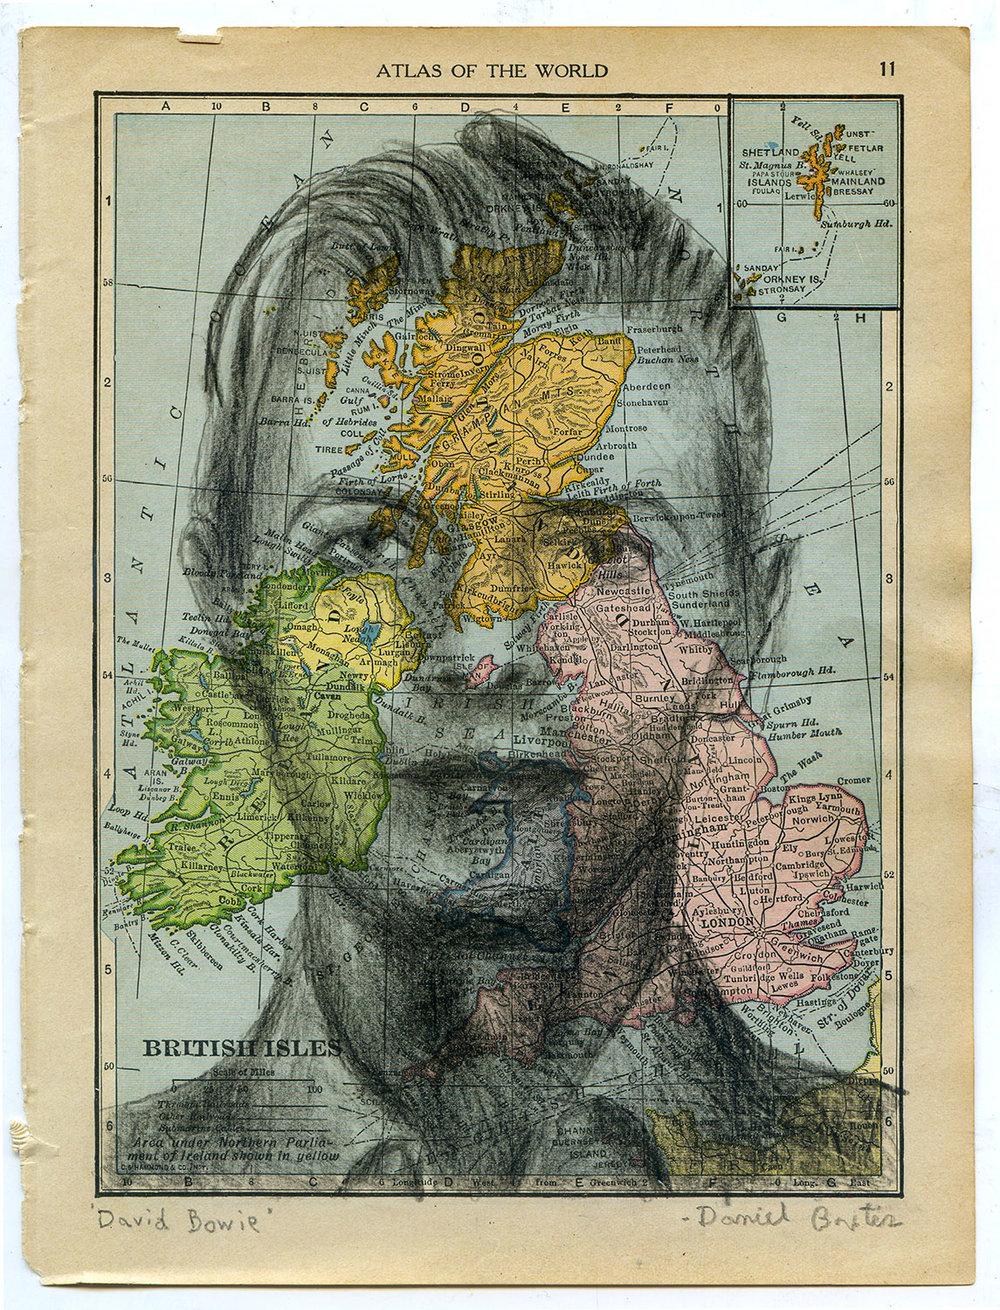 Daniel Baxter David Bowie Portrait.jpg